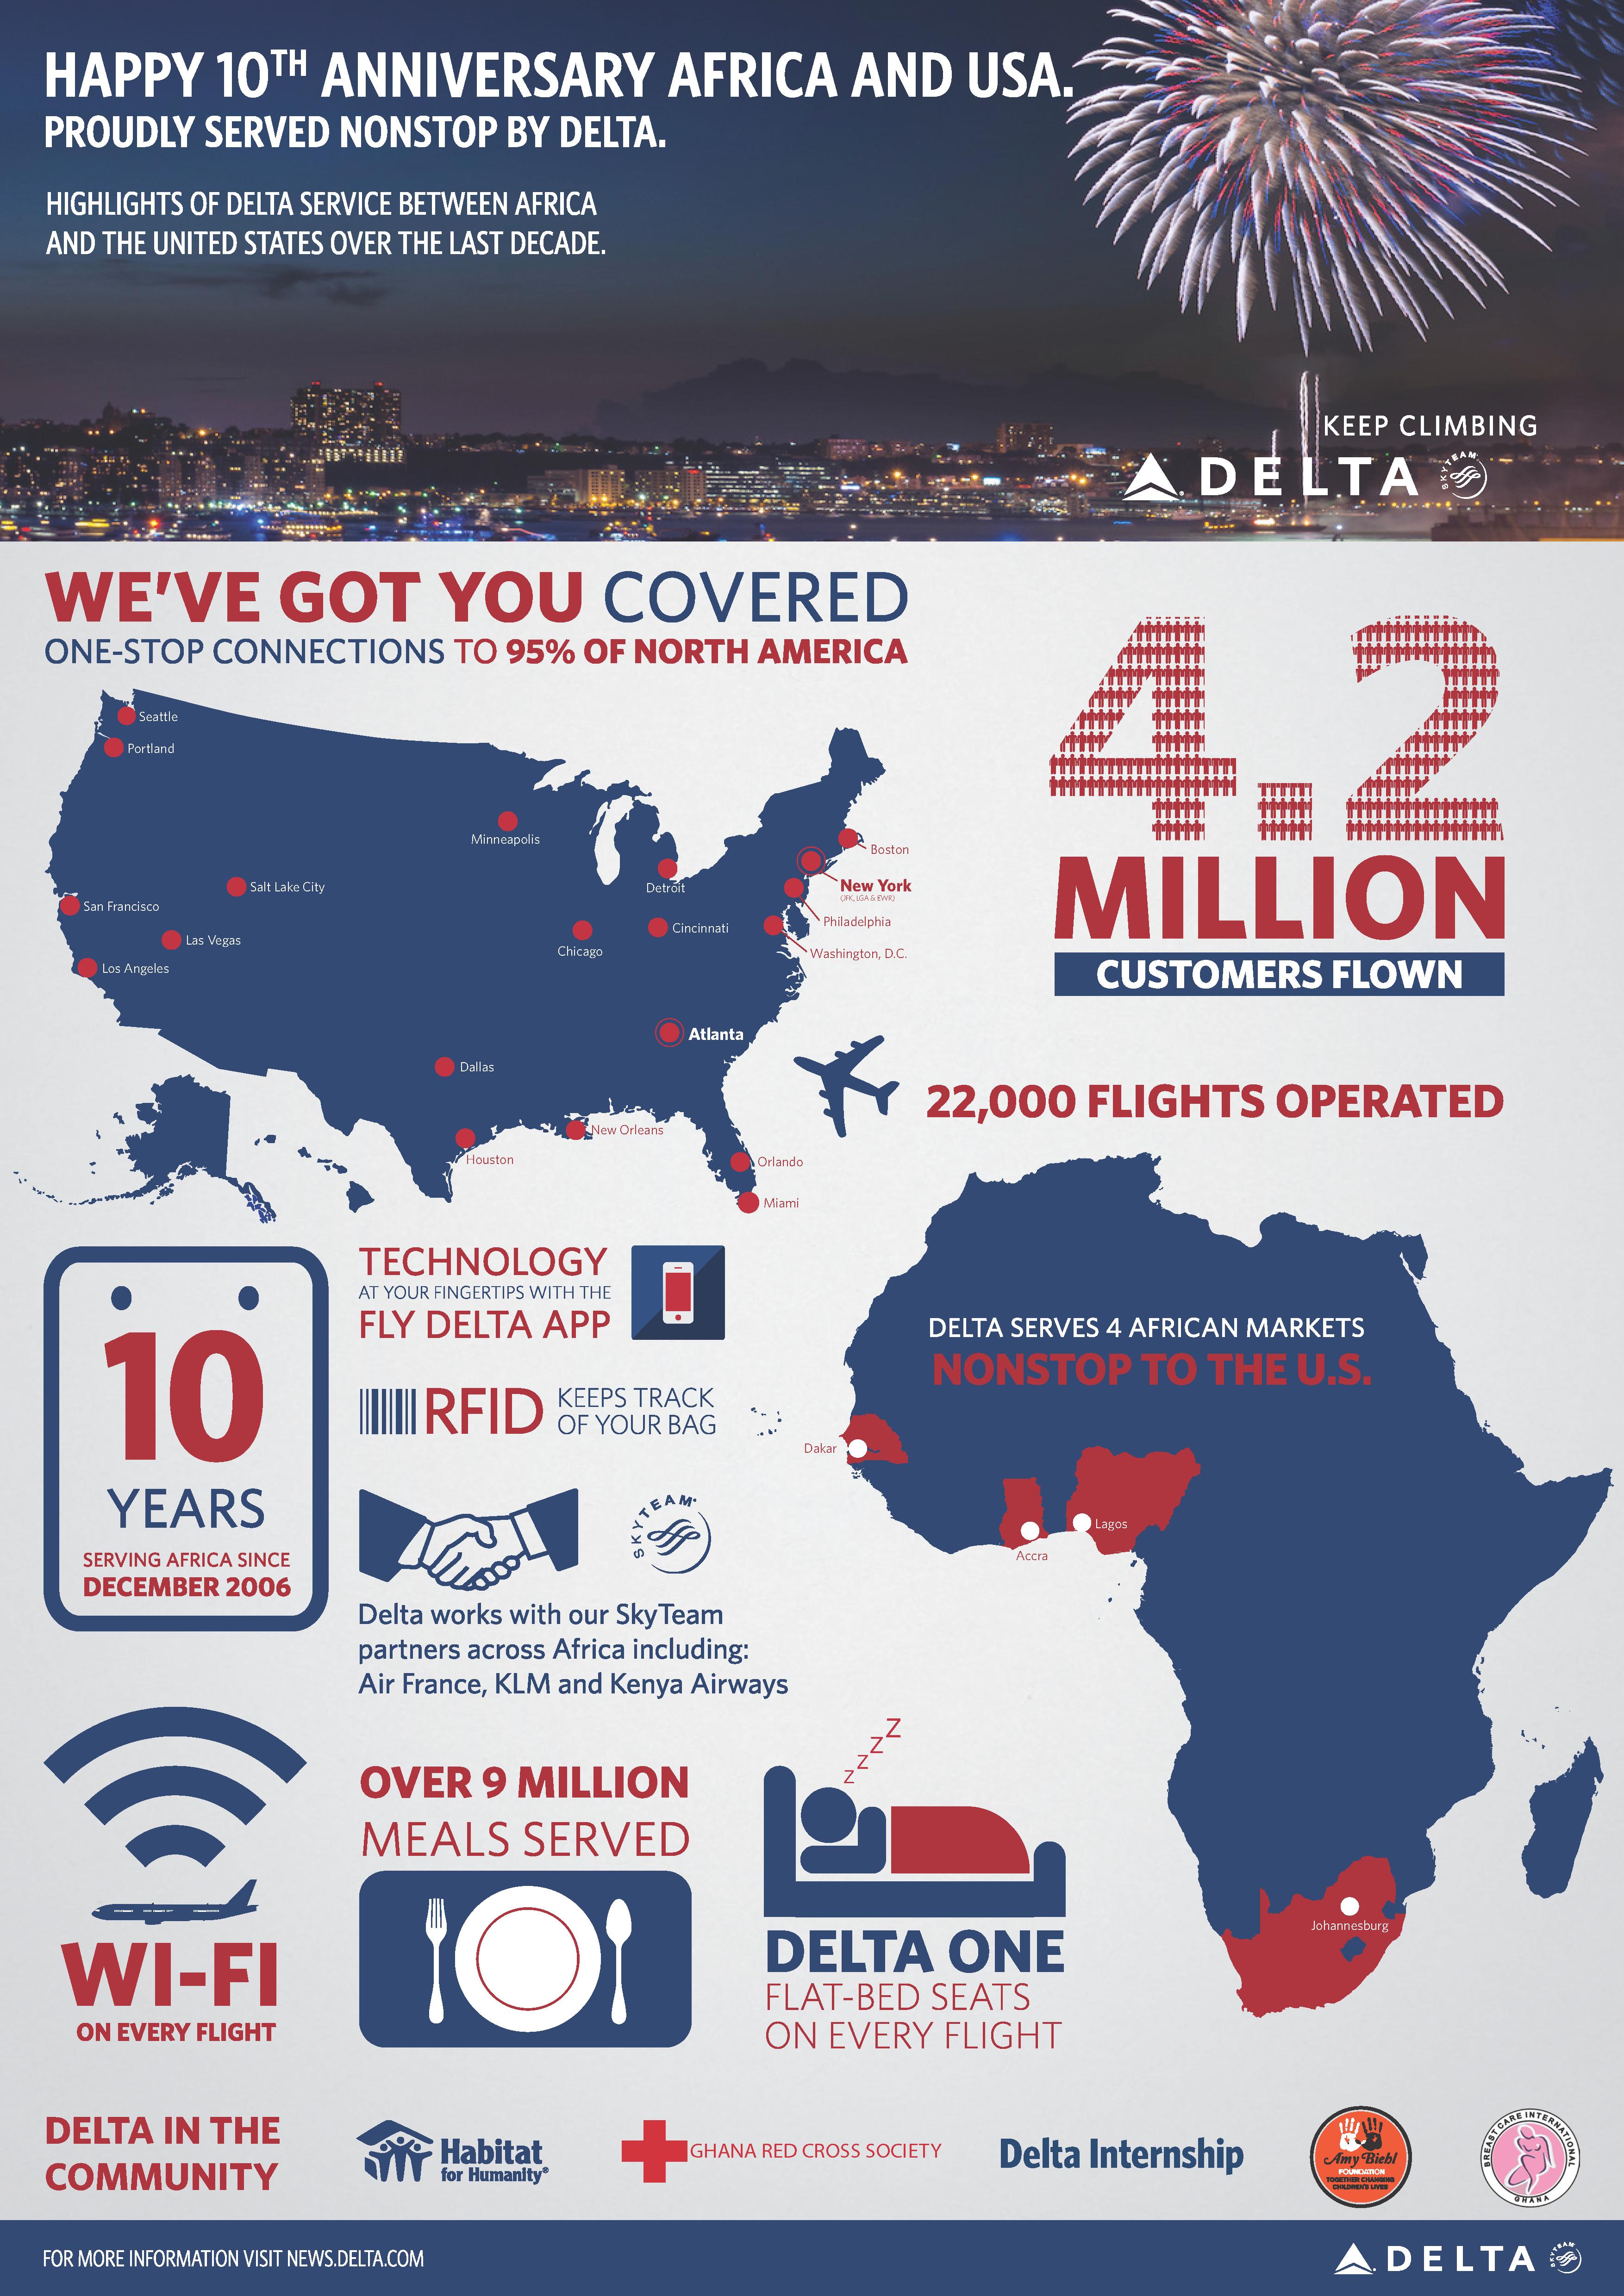 Africa 10th anniversary graphic